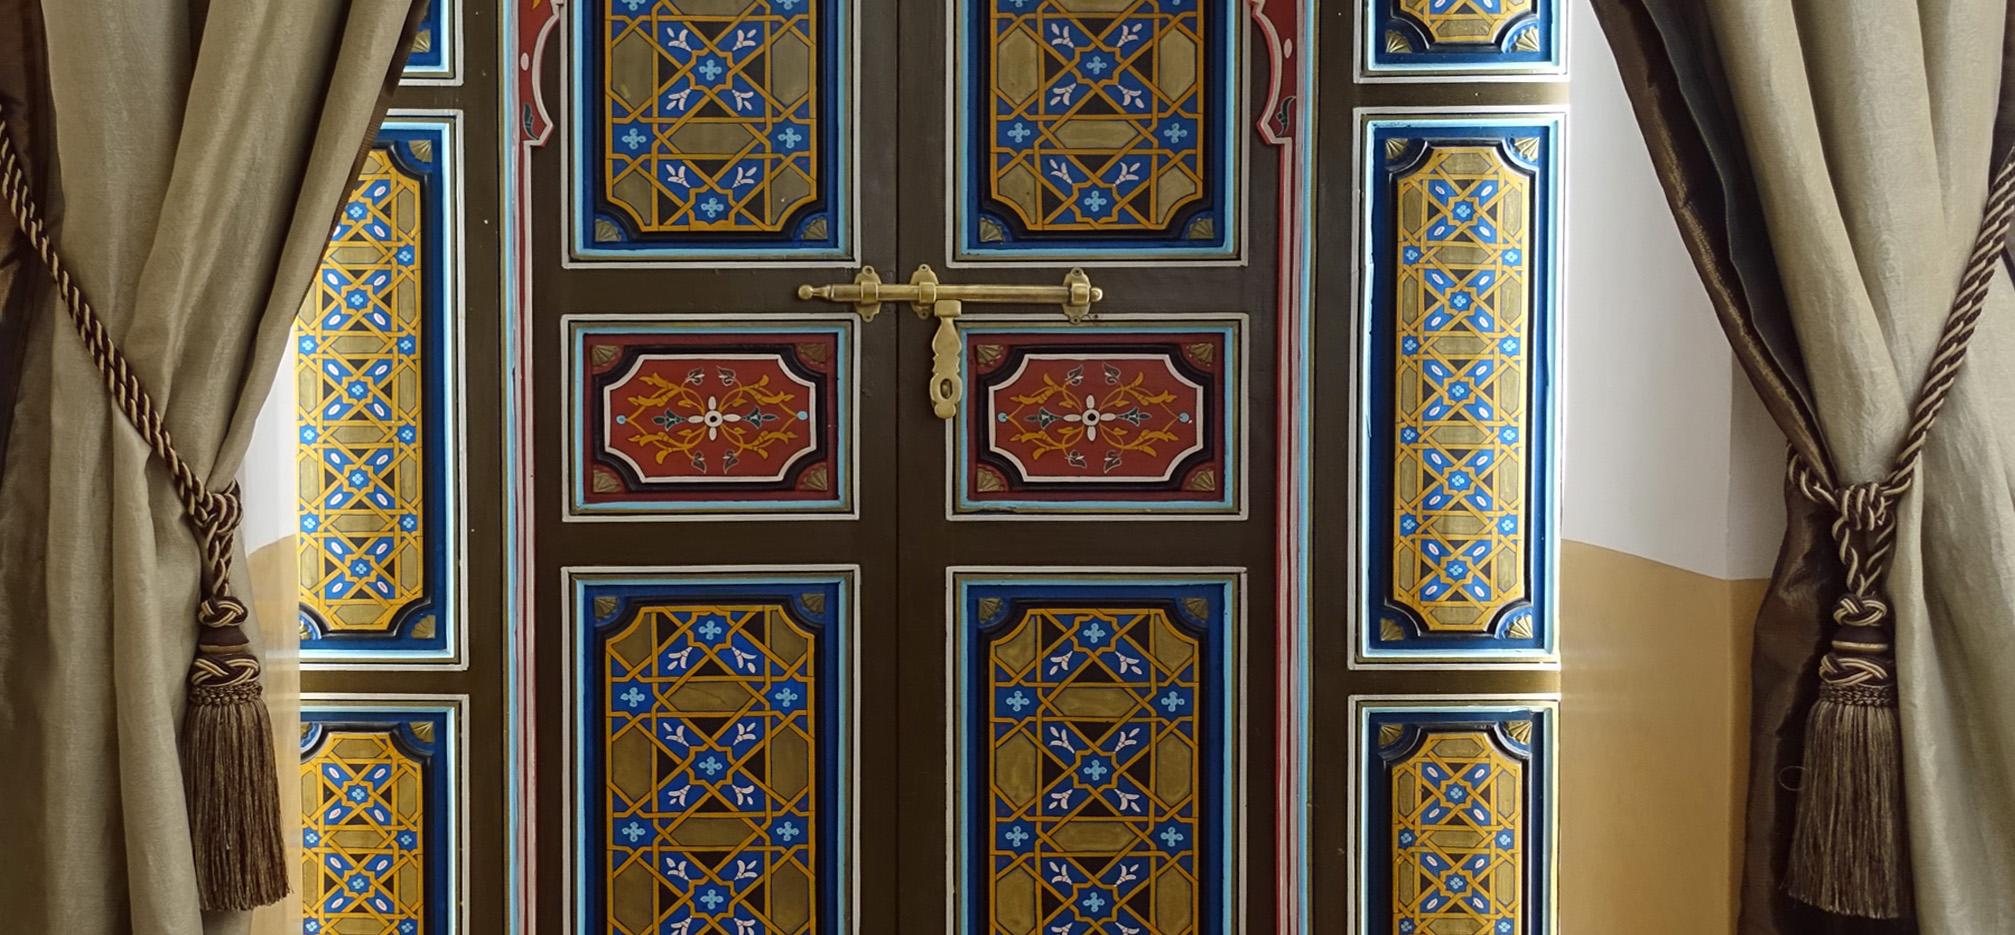 Jauzi 3 Doors